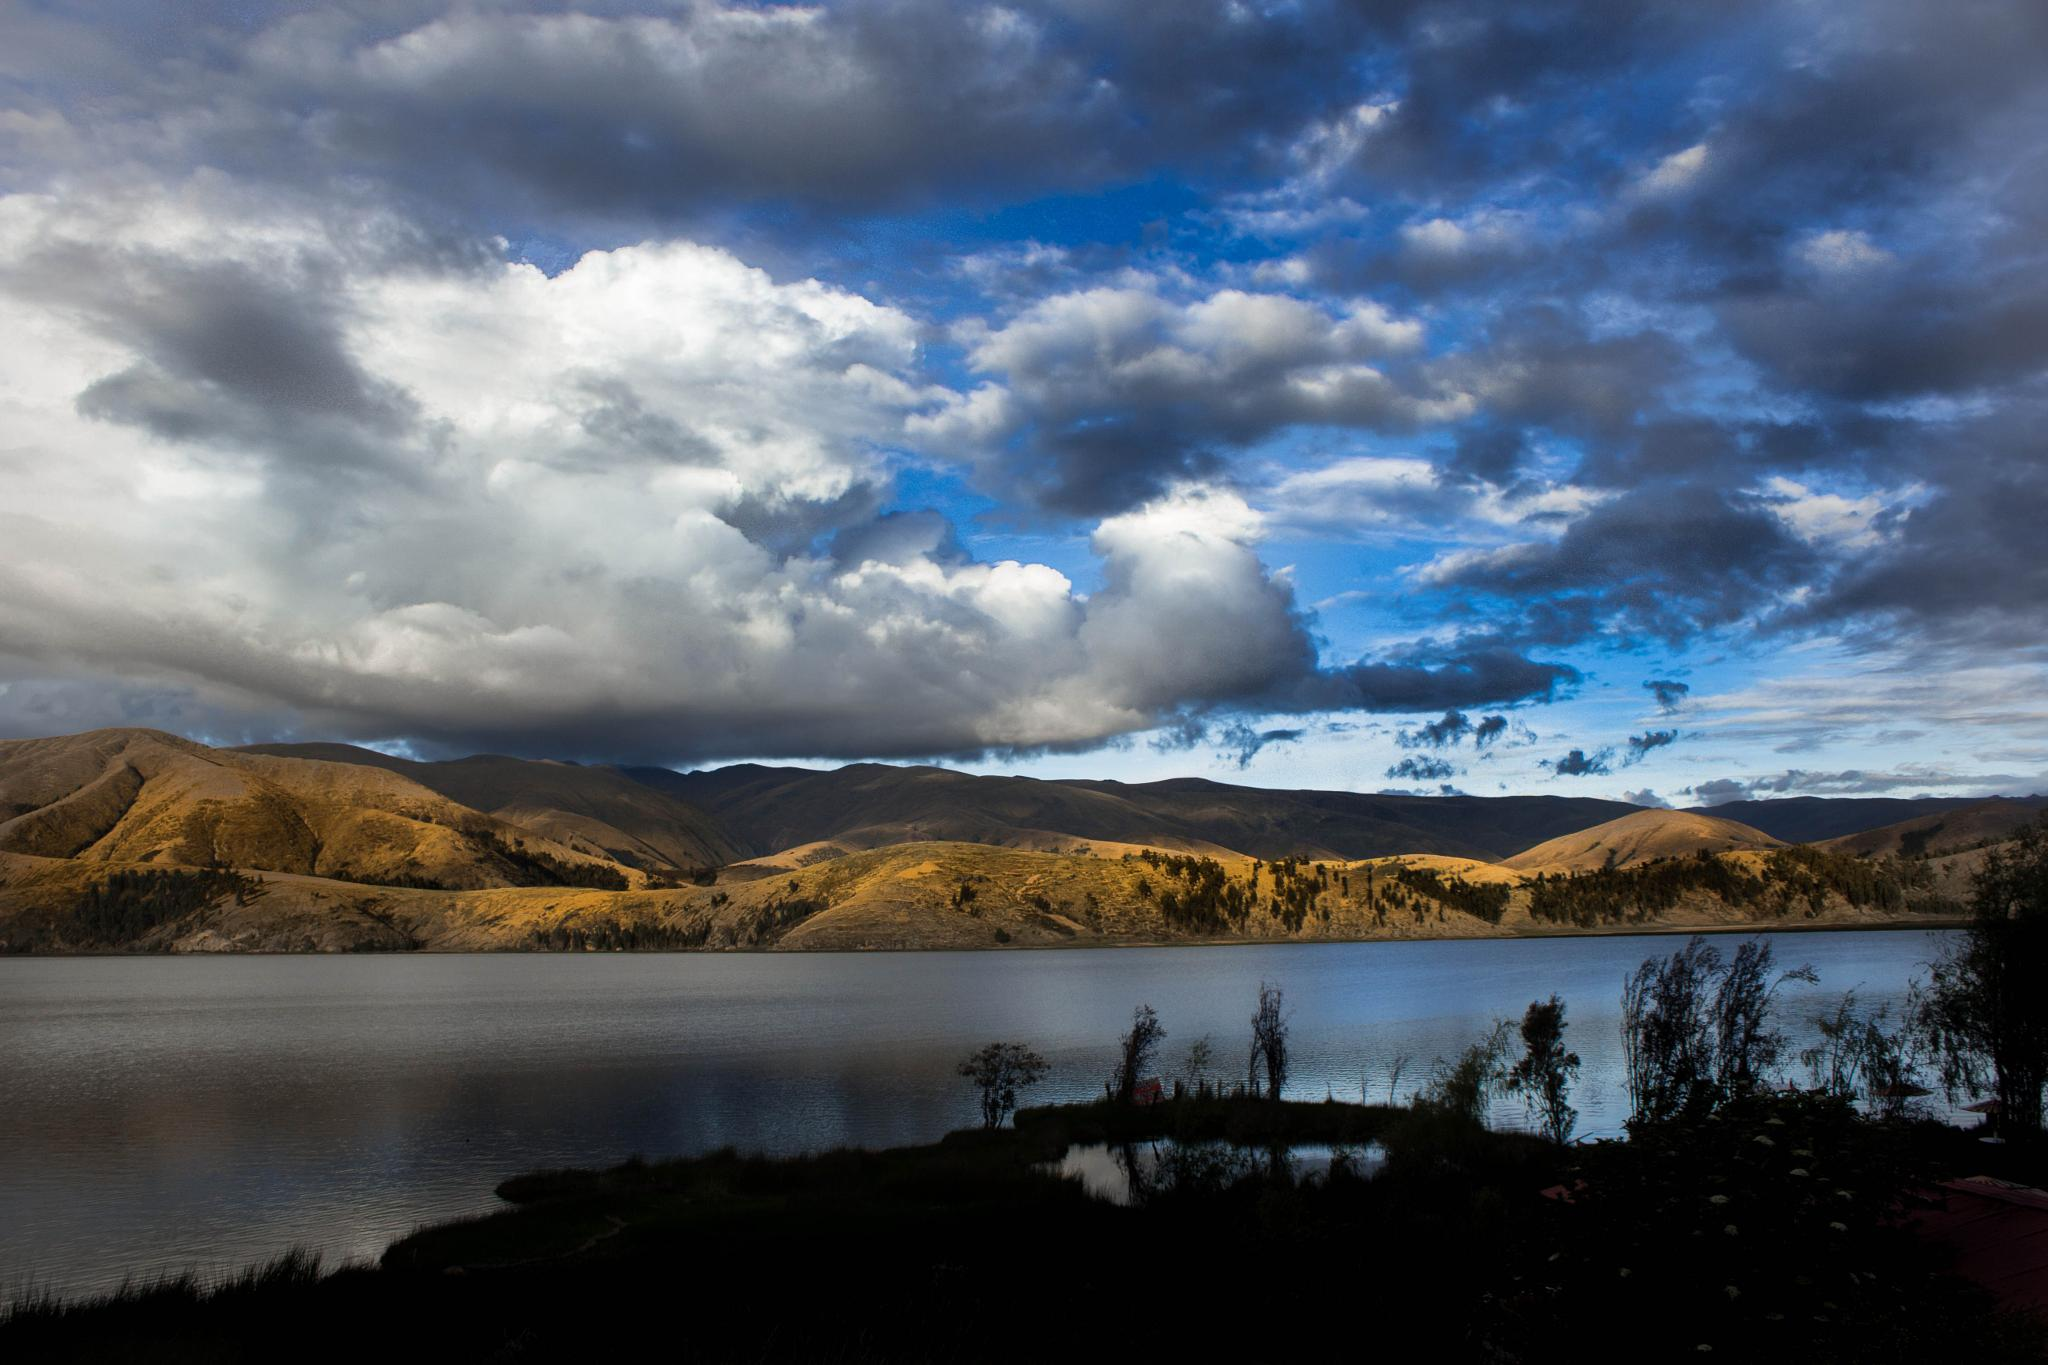 Laguna de Paca-Perú by FratelliPizarro